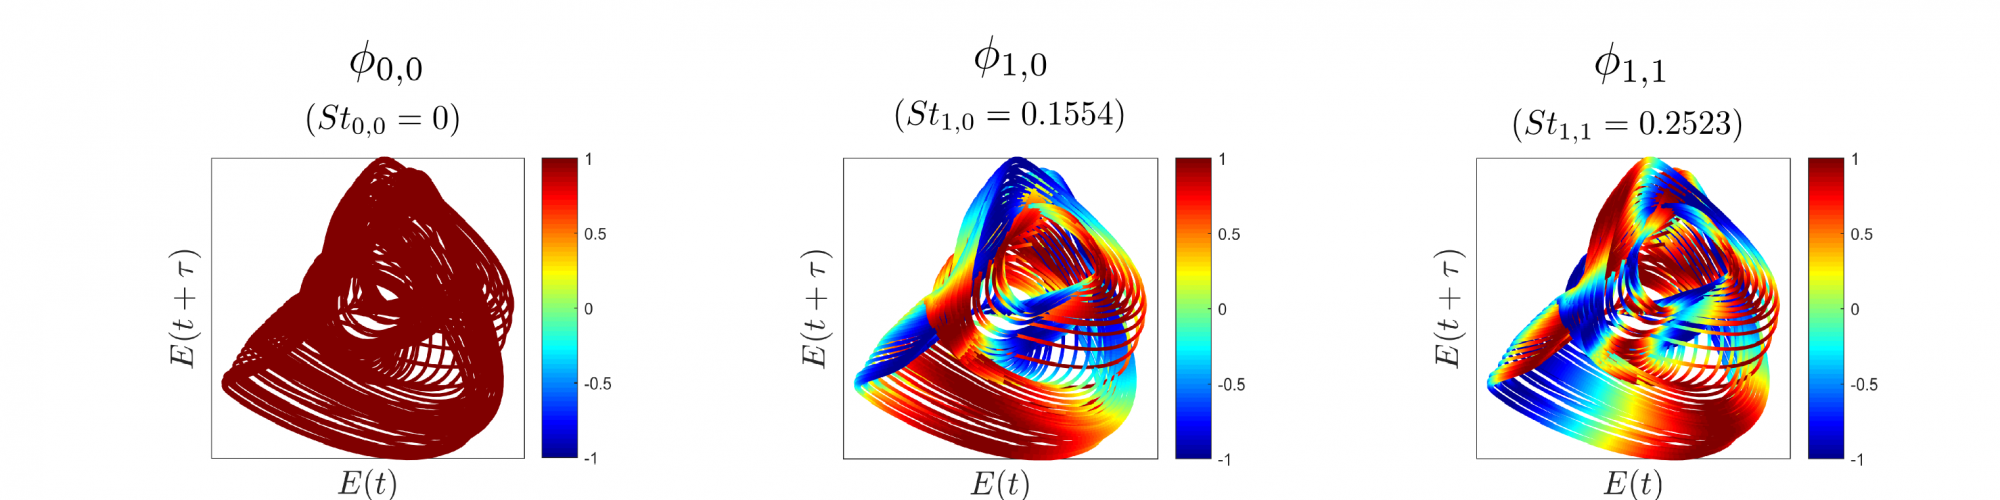 Koopman operator theory and fluid mechanics   Mezić Research Group